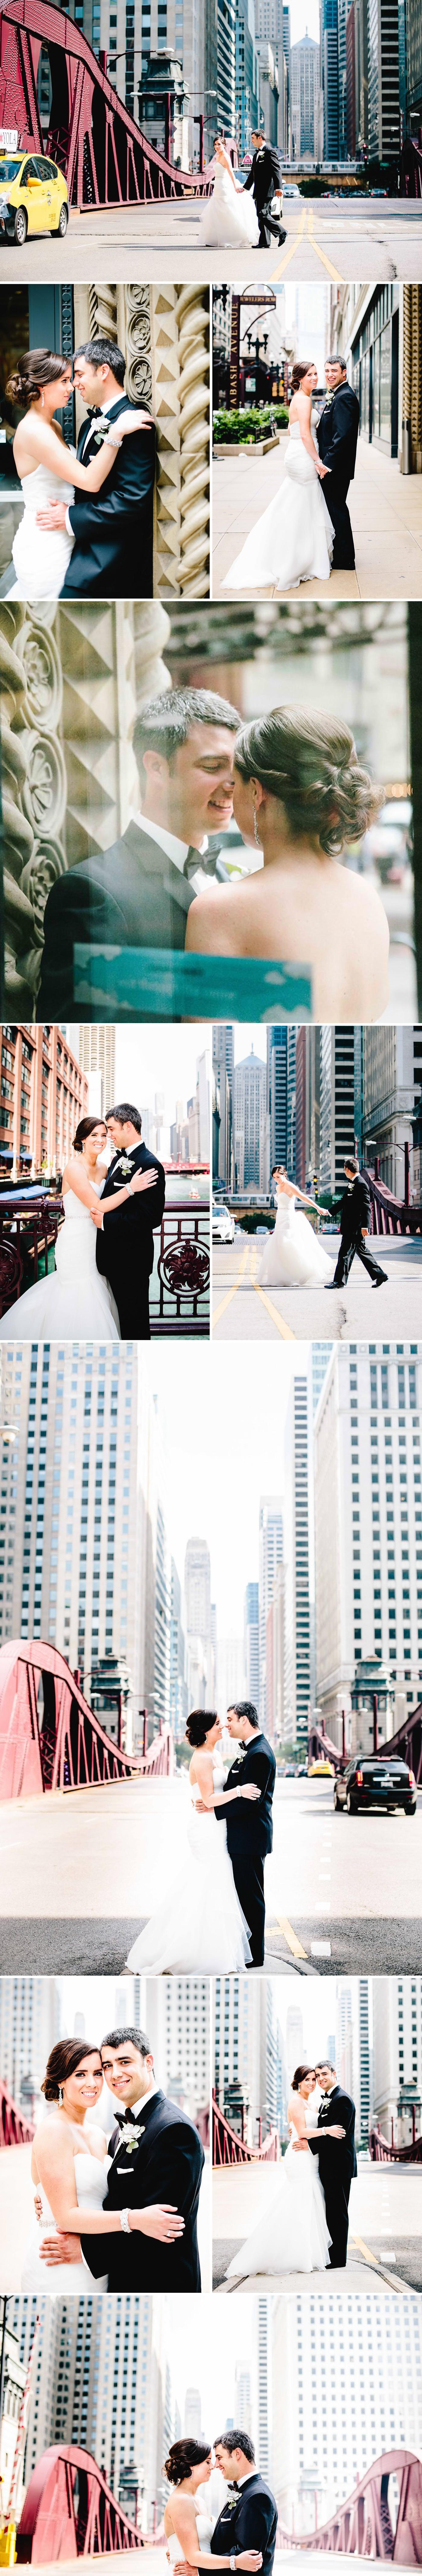 chicago-fine-art-wedding-photography-cassata4